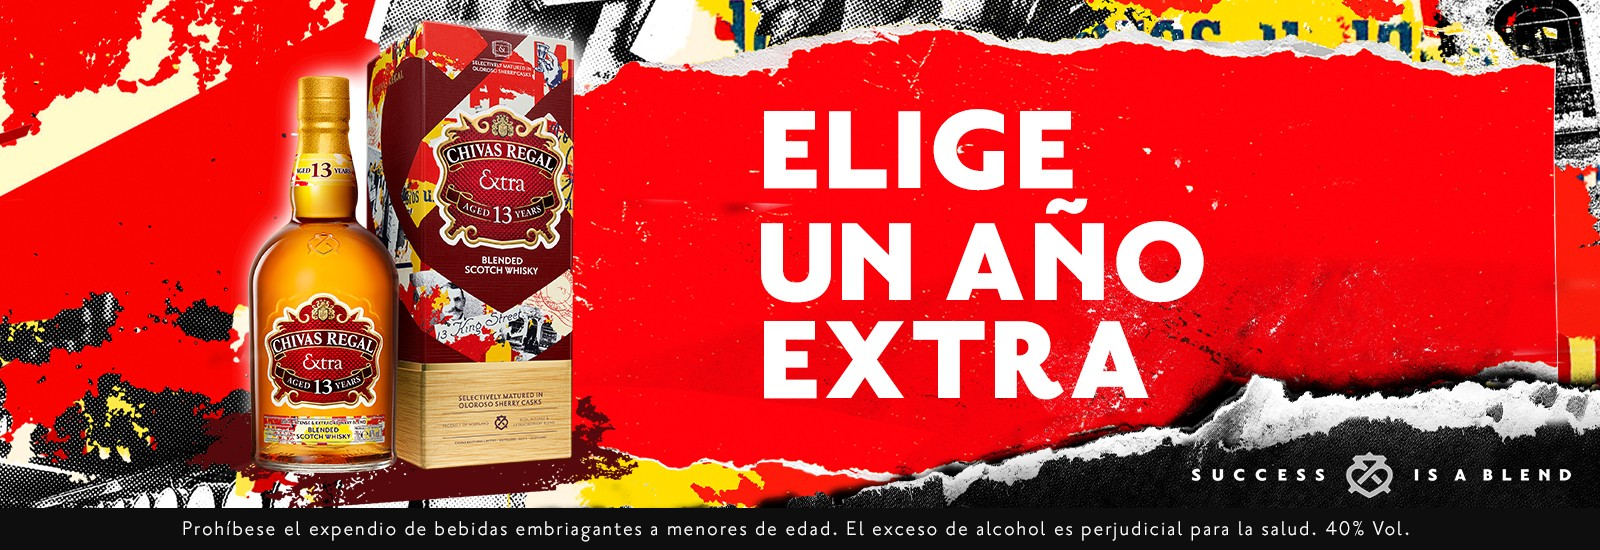 Whisky Chivas Extra 13 700 ml